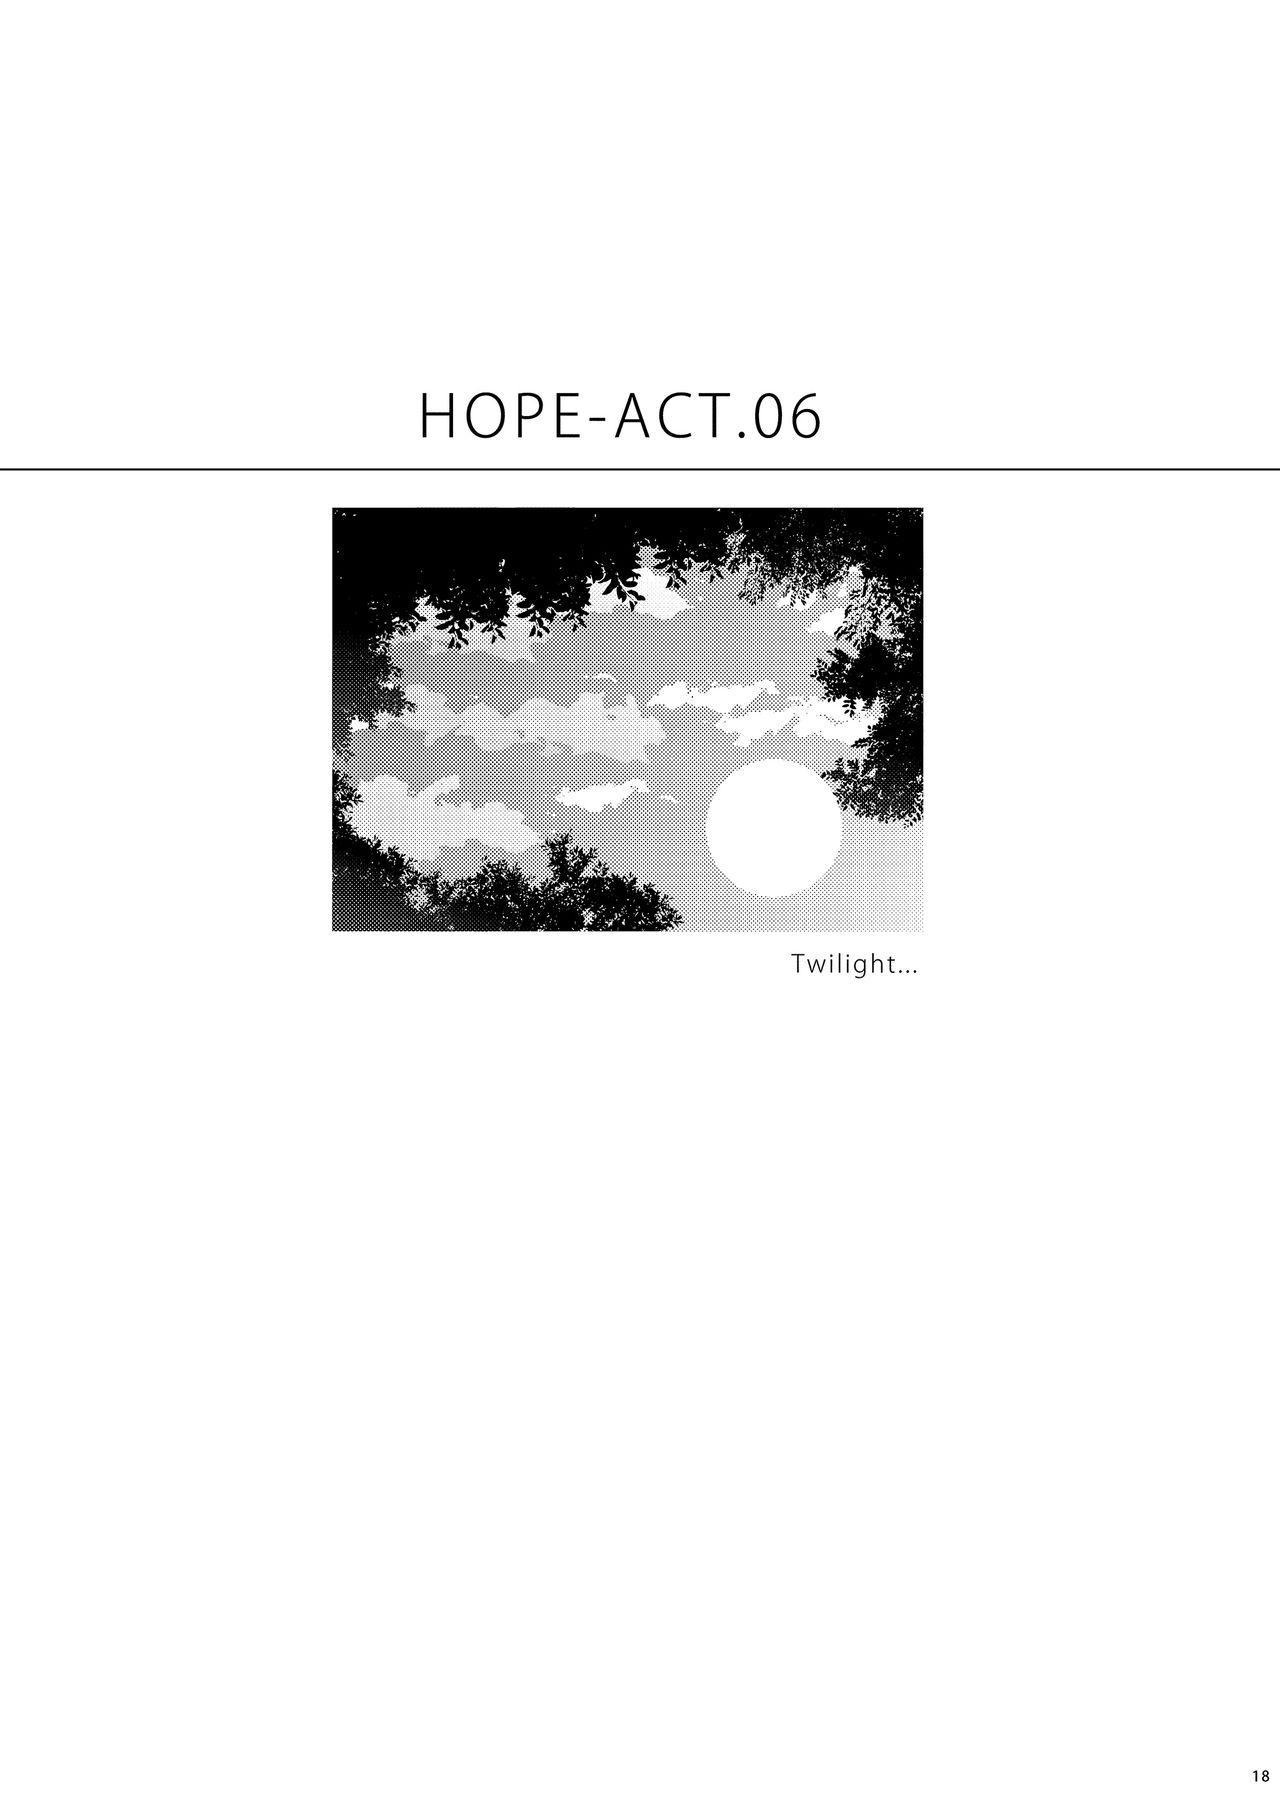 HOPE-ACT. 06 17